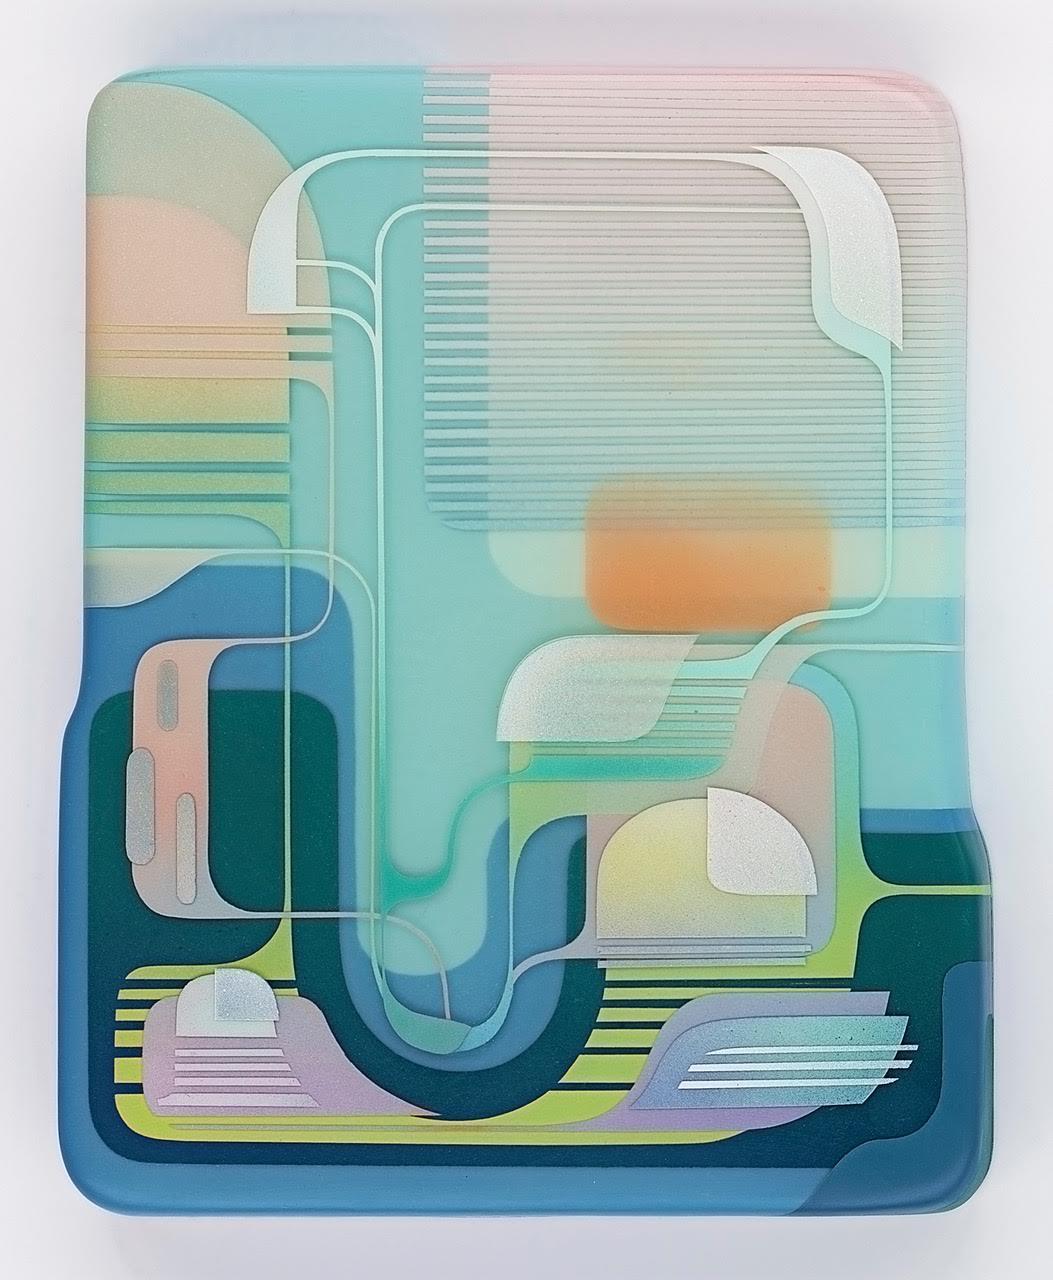 "Francesco Lo Castro, ""Terrapharma,"" 2016. Acrylic, spray enamel and layered epoxy resin on wood, 16 x 20 inches"